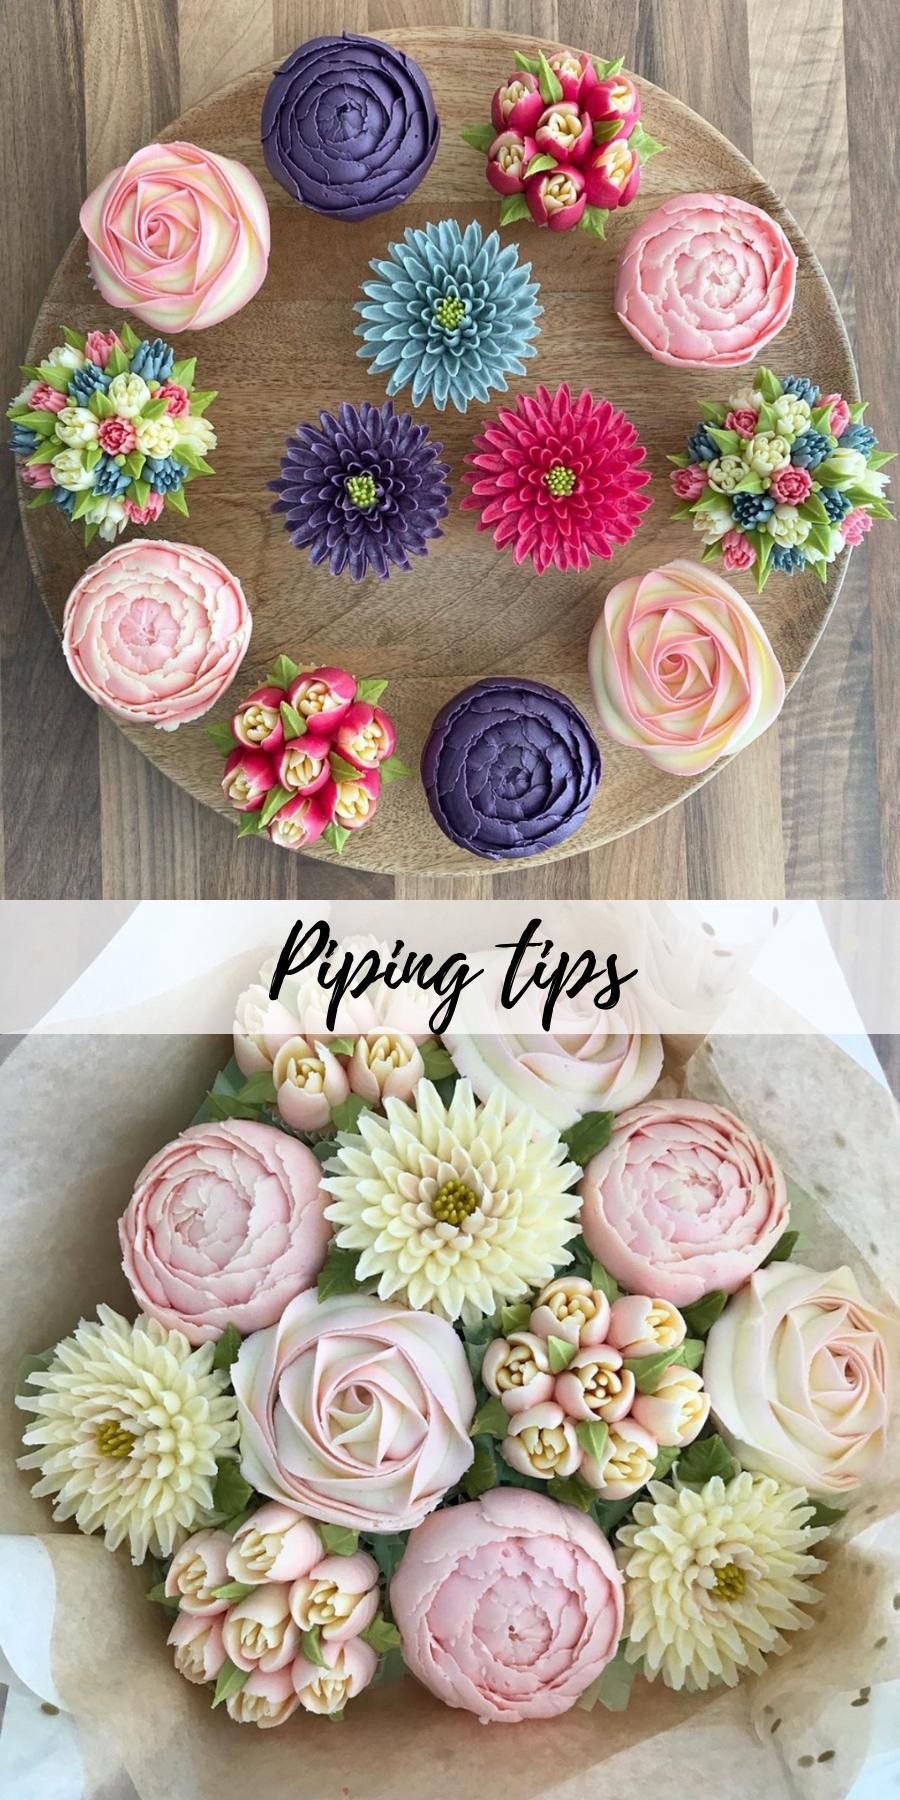 Pin on flower cake ideas